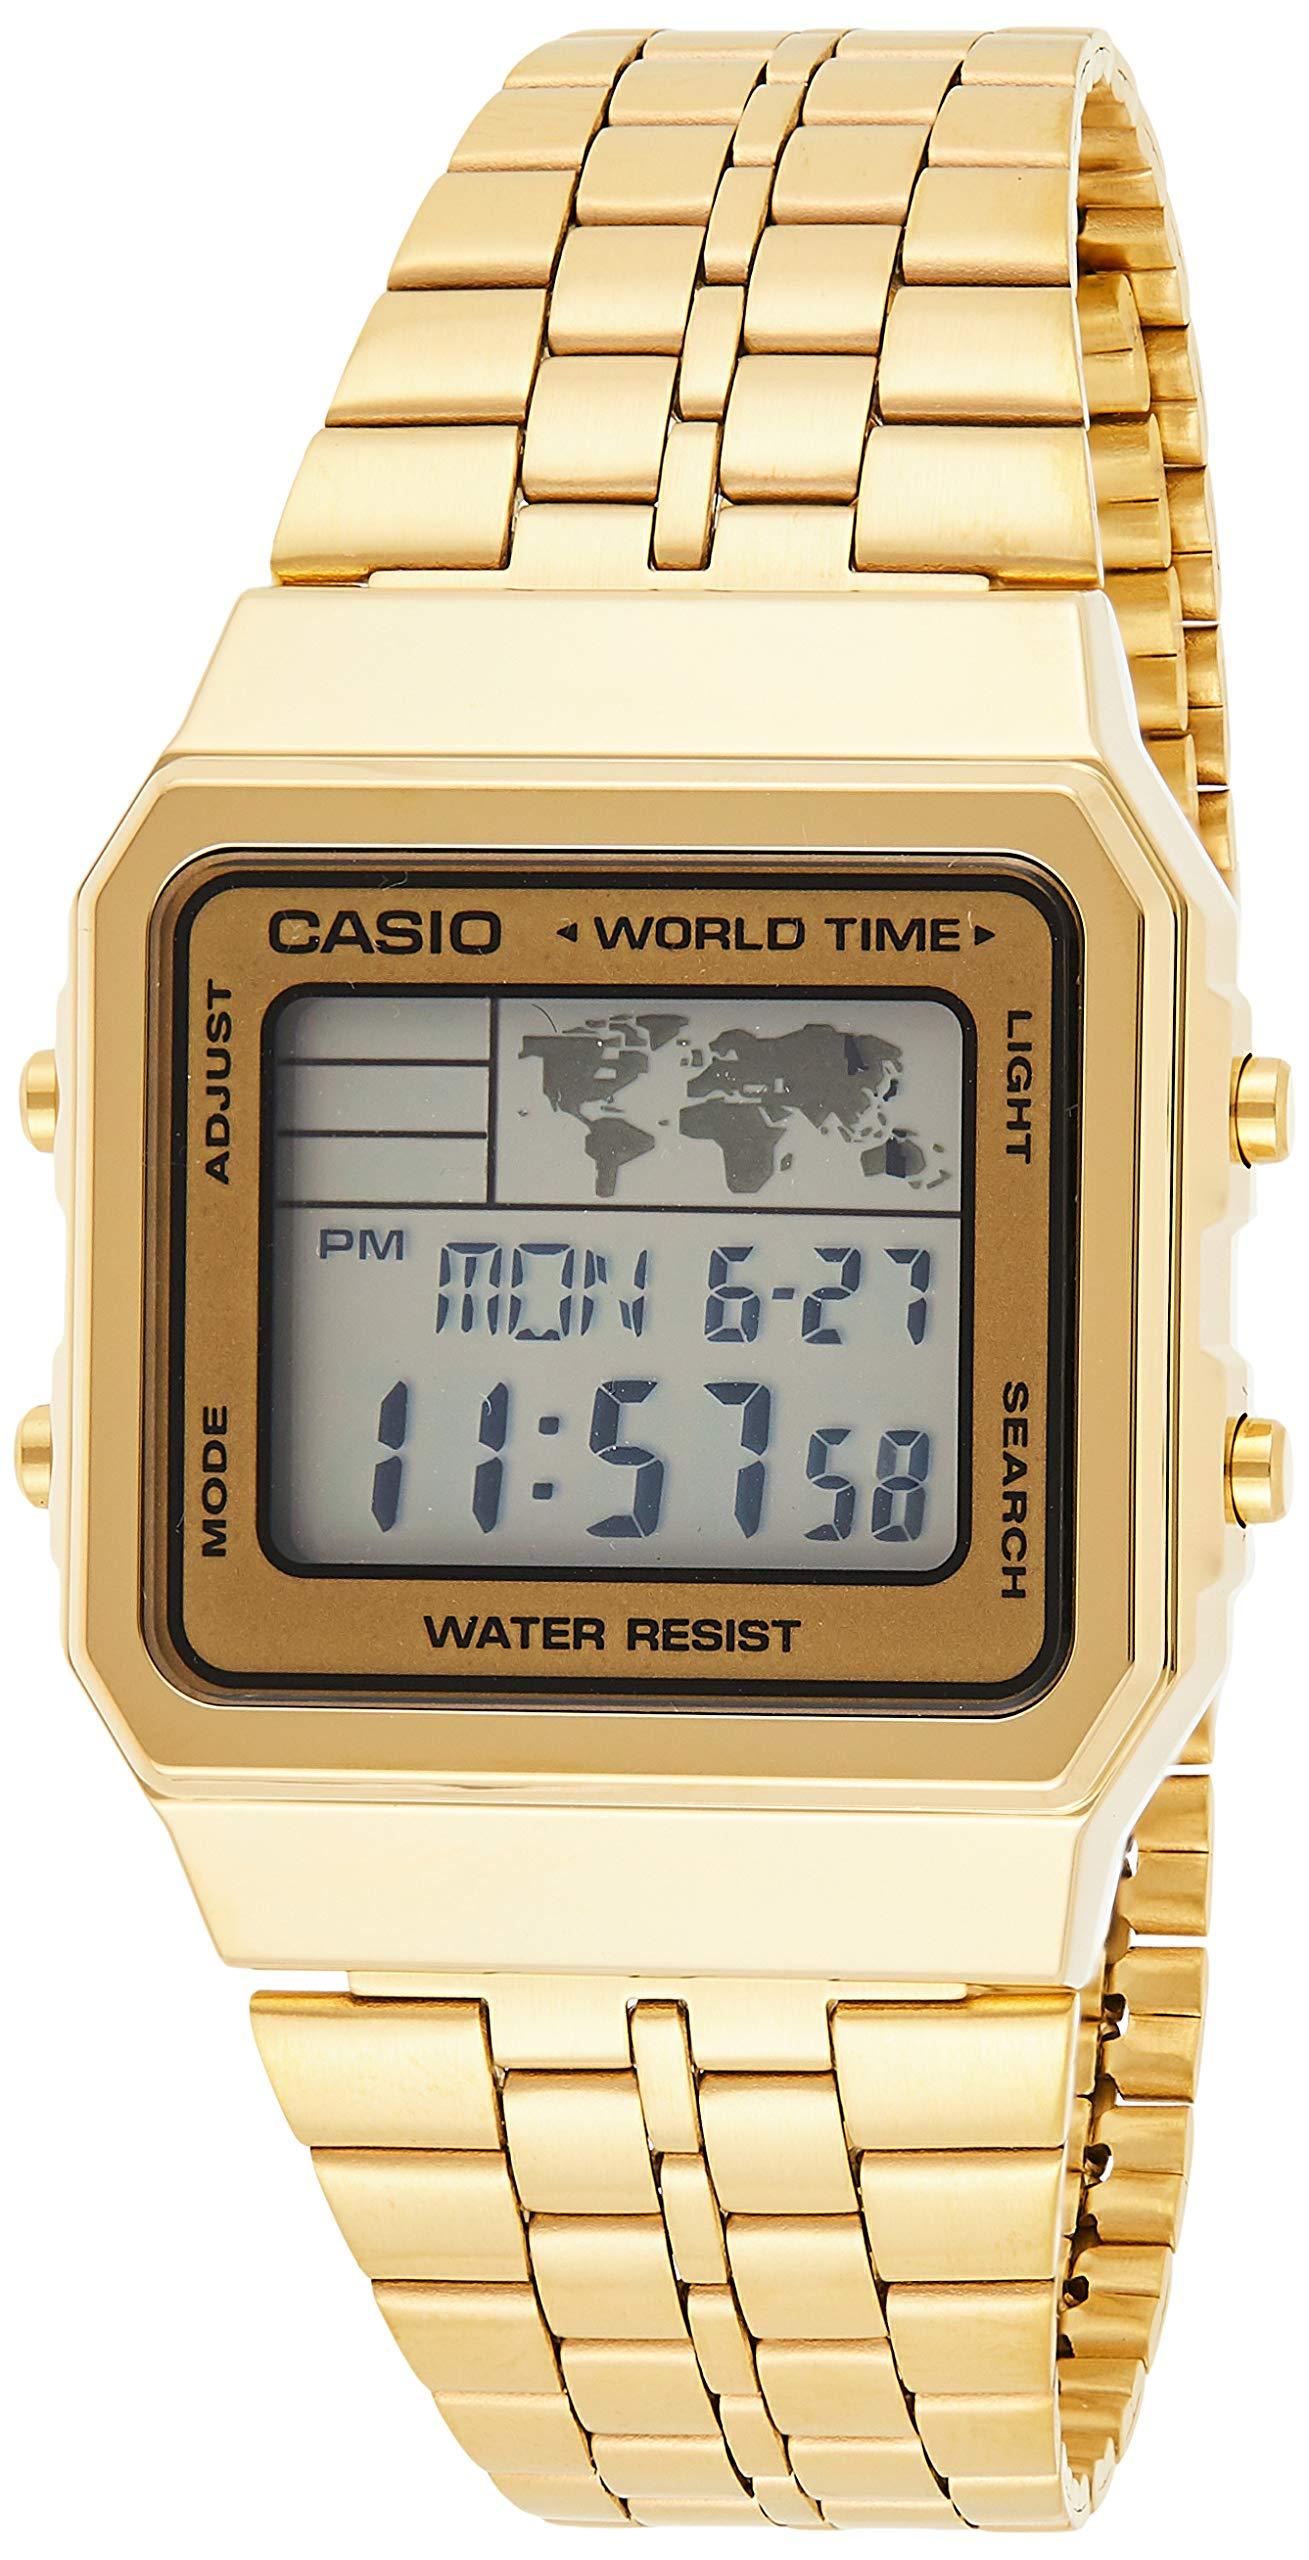 Casio Men's Digital Watch, Digital Display and Stainless Steel Strap